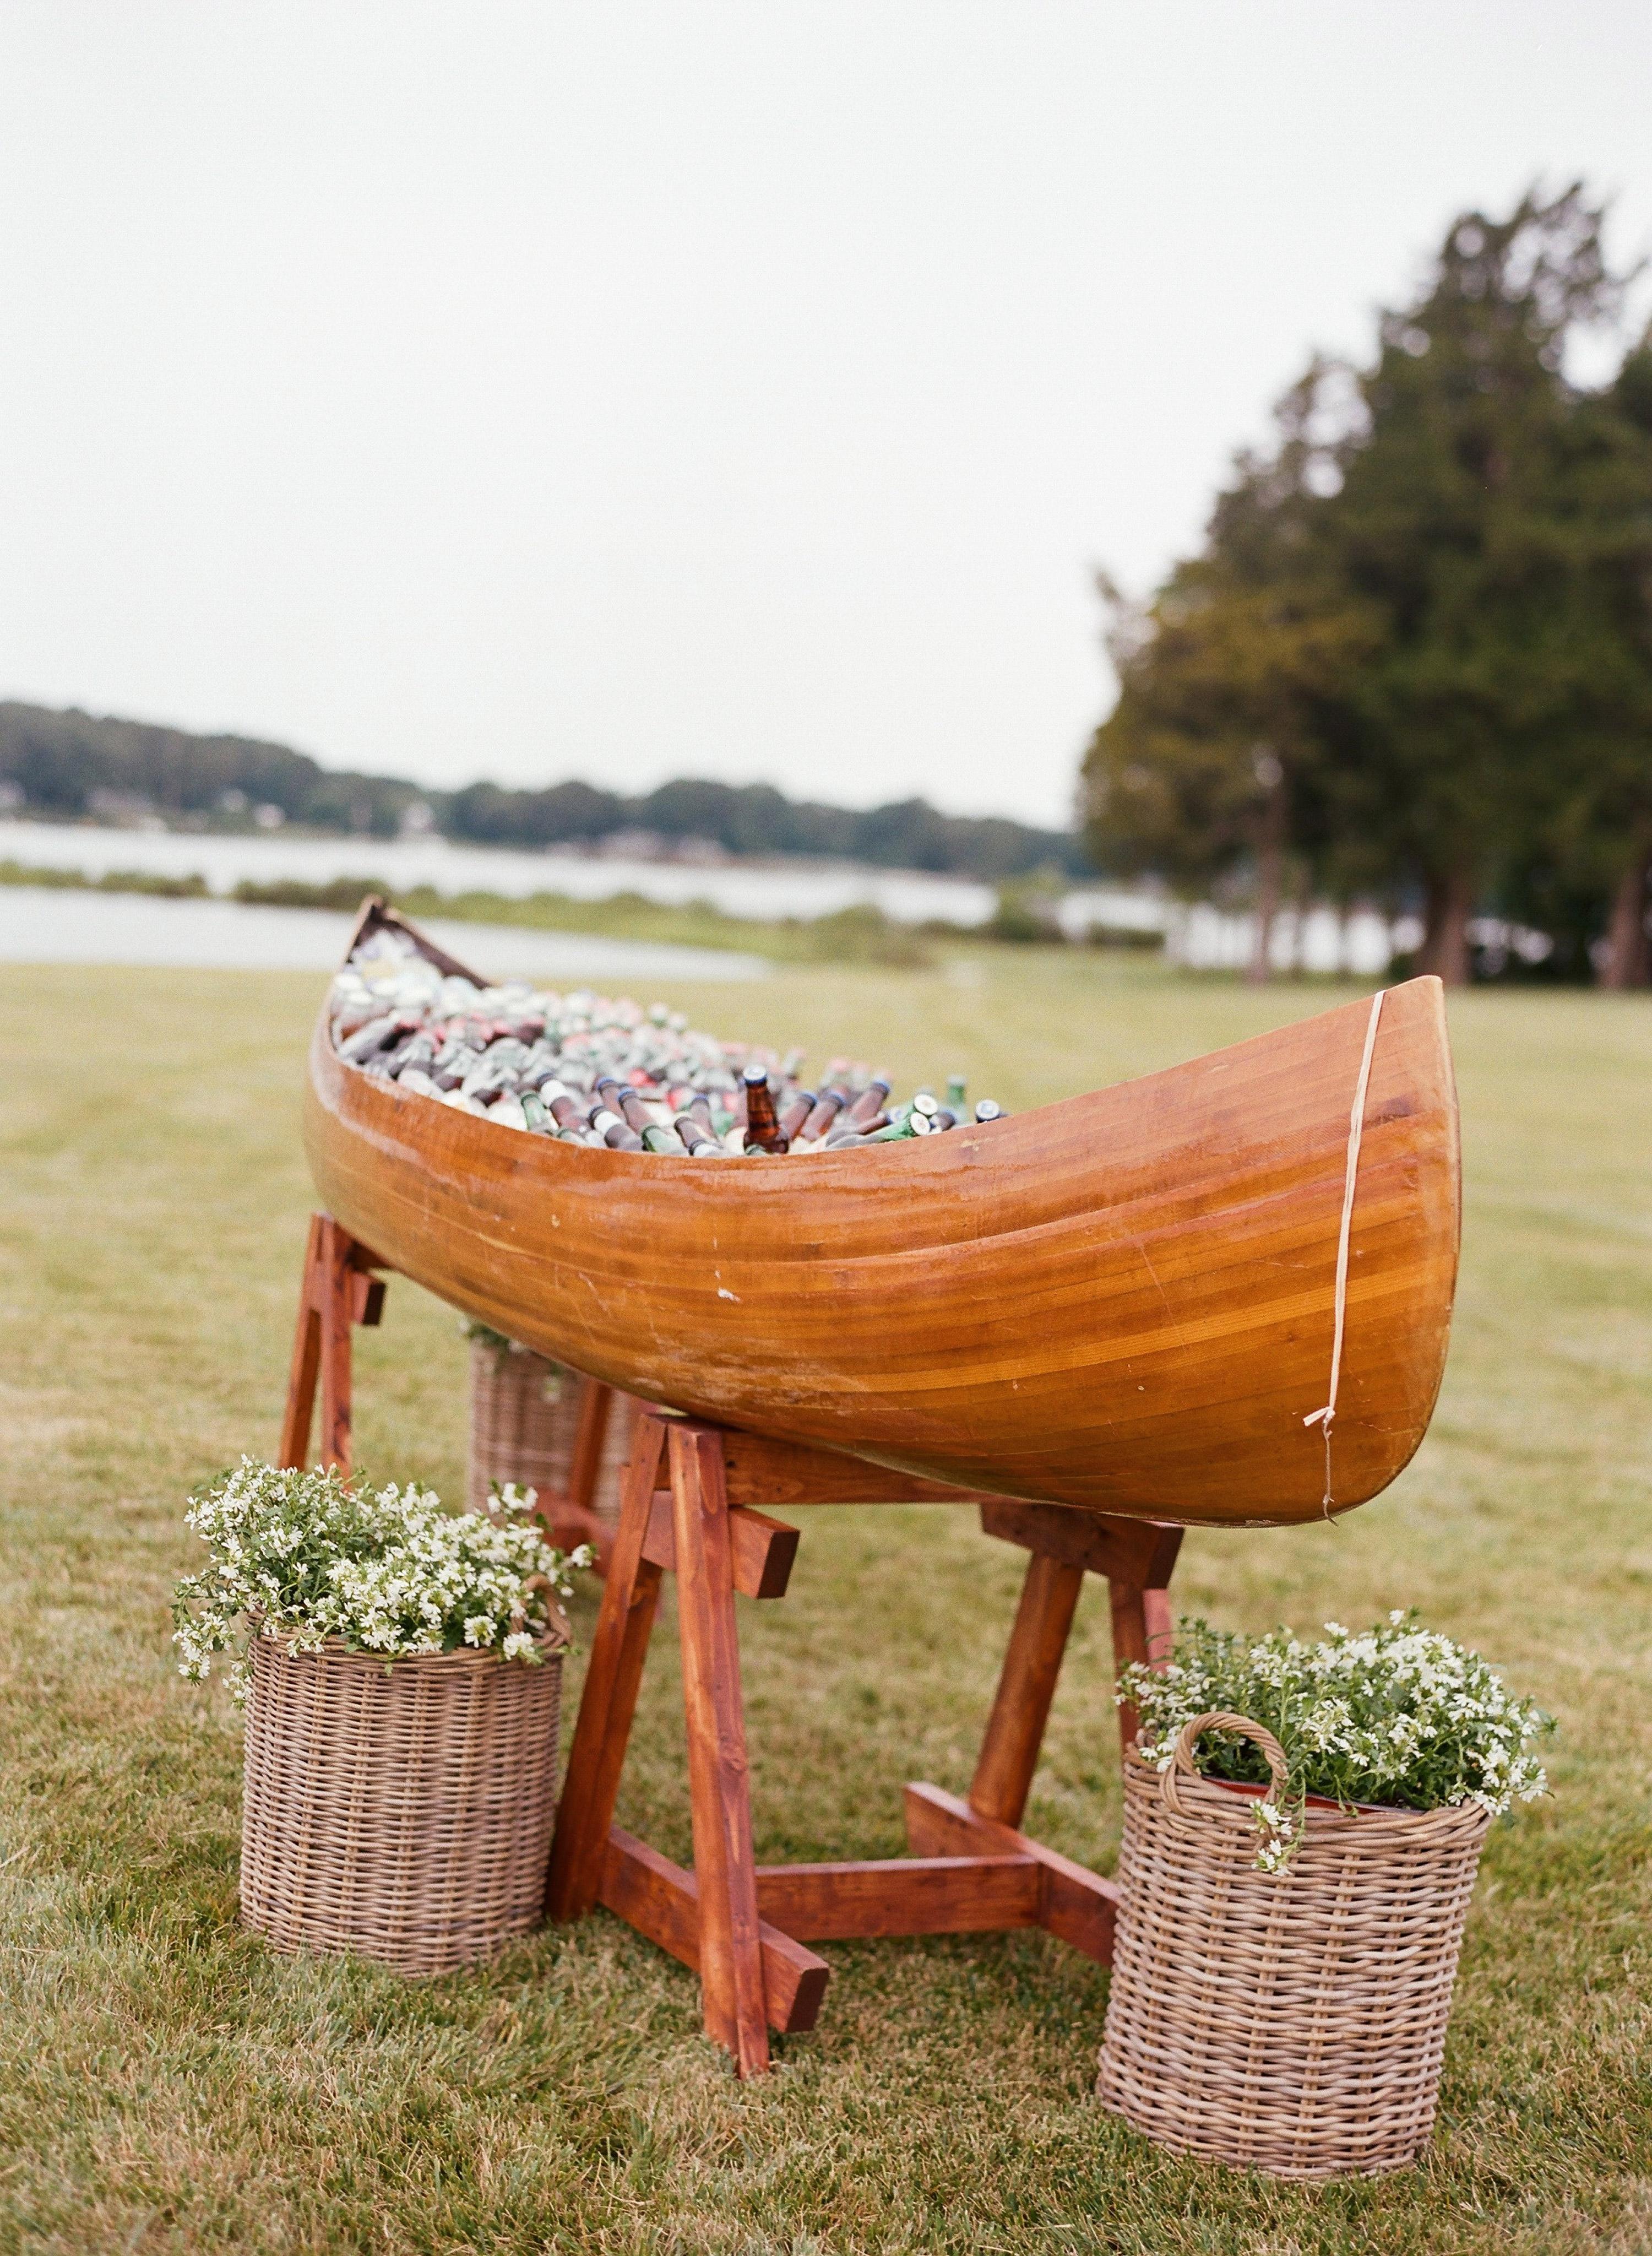 caroline kyle patriotic party beer canoe